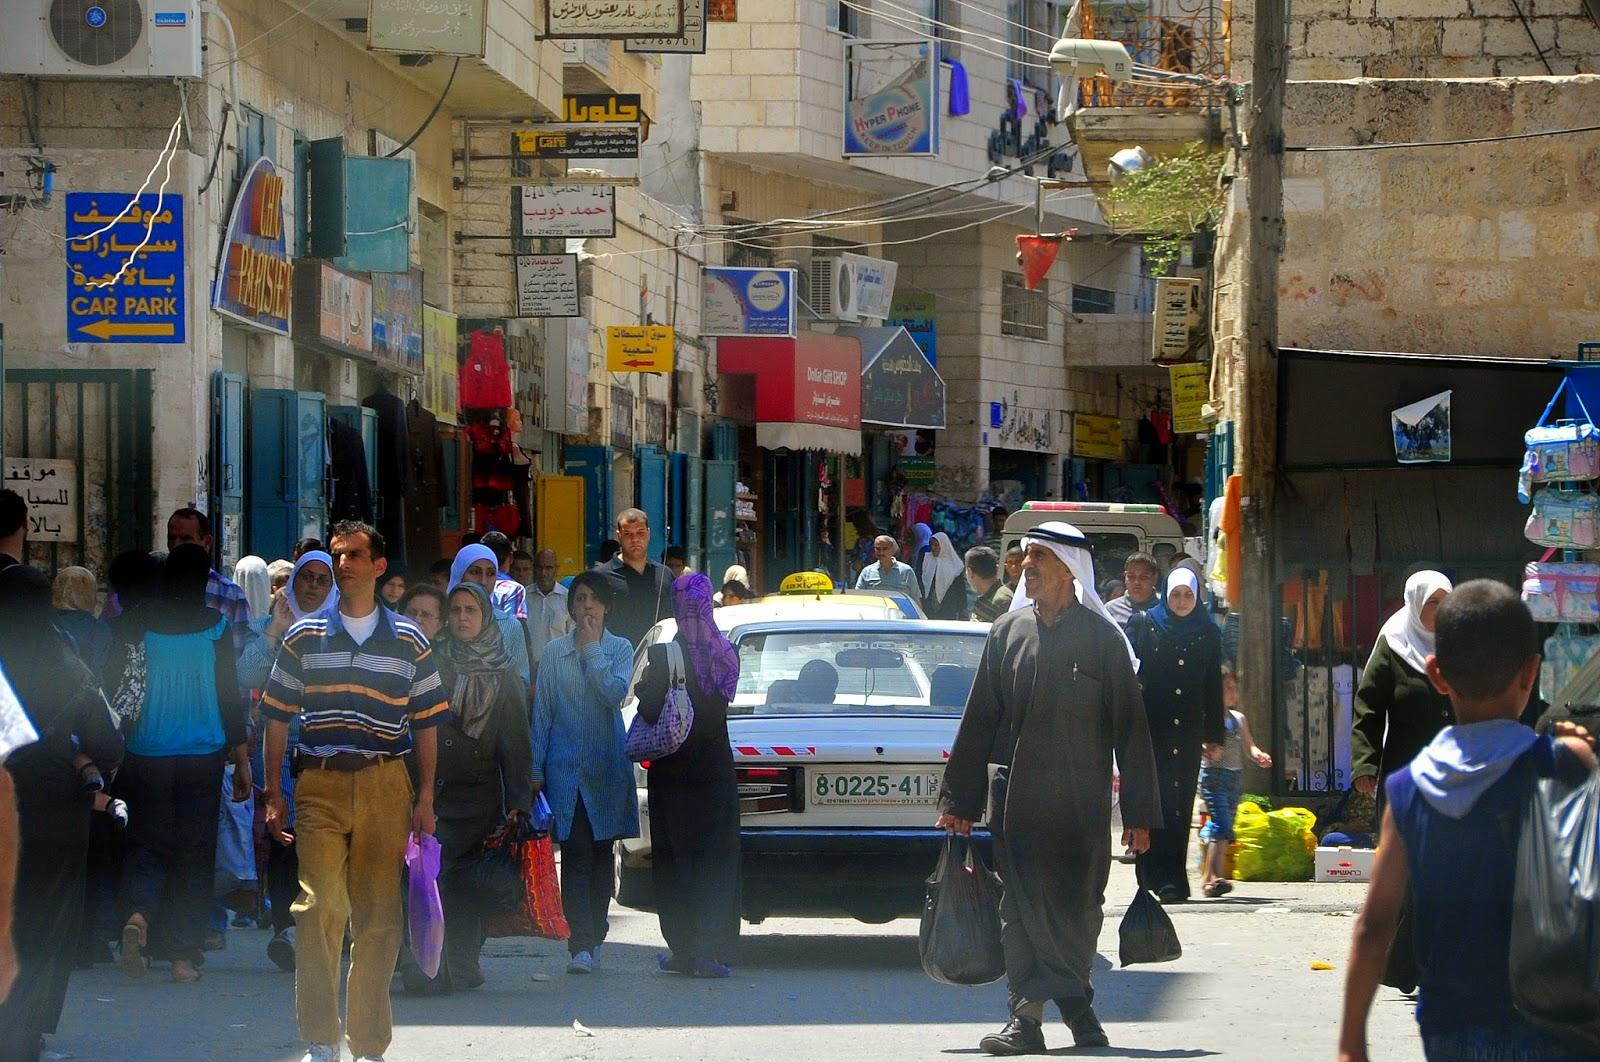 Über 85 prozent der bewohner bethlehems sind muslime